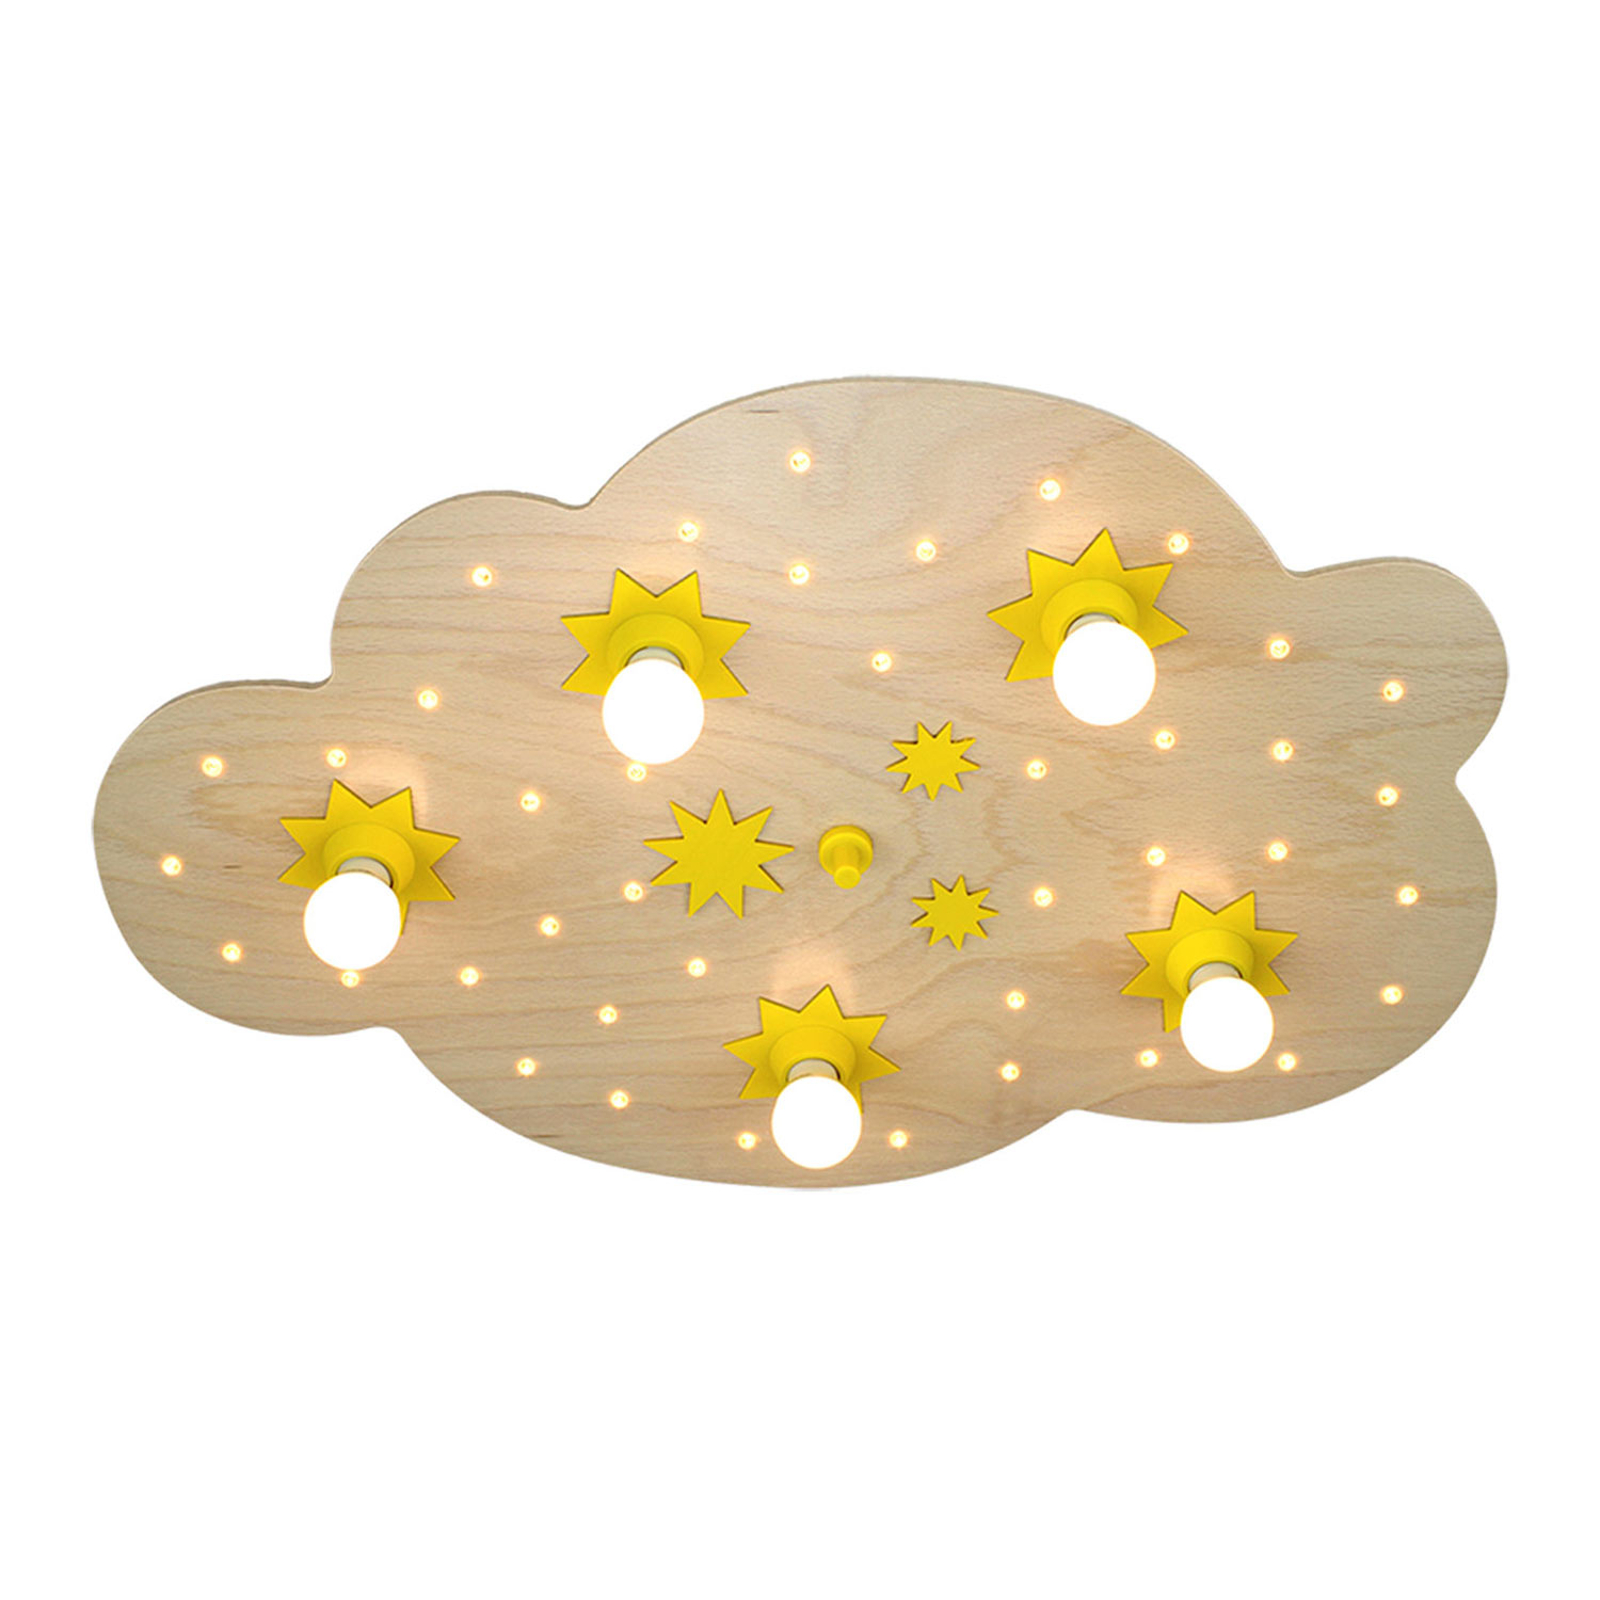 Plafondlamp Sterrenwolk, in beuken natuur, 75 cm